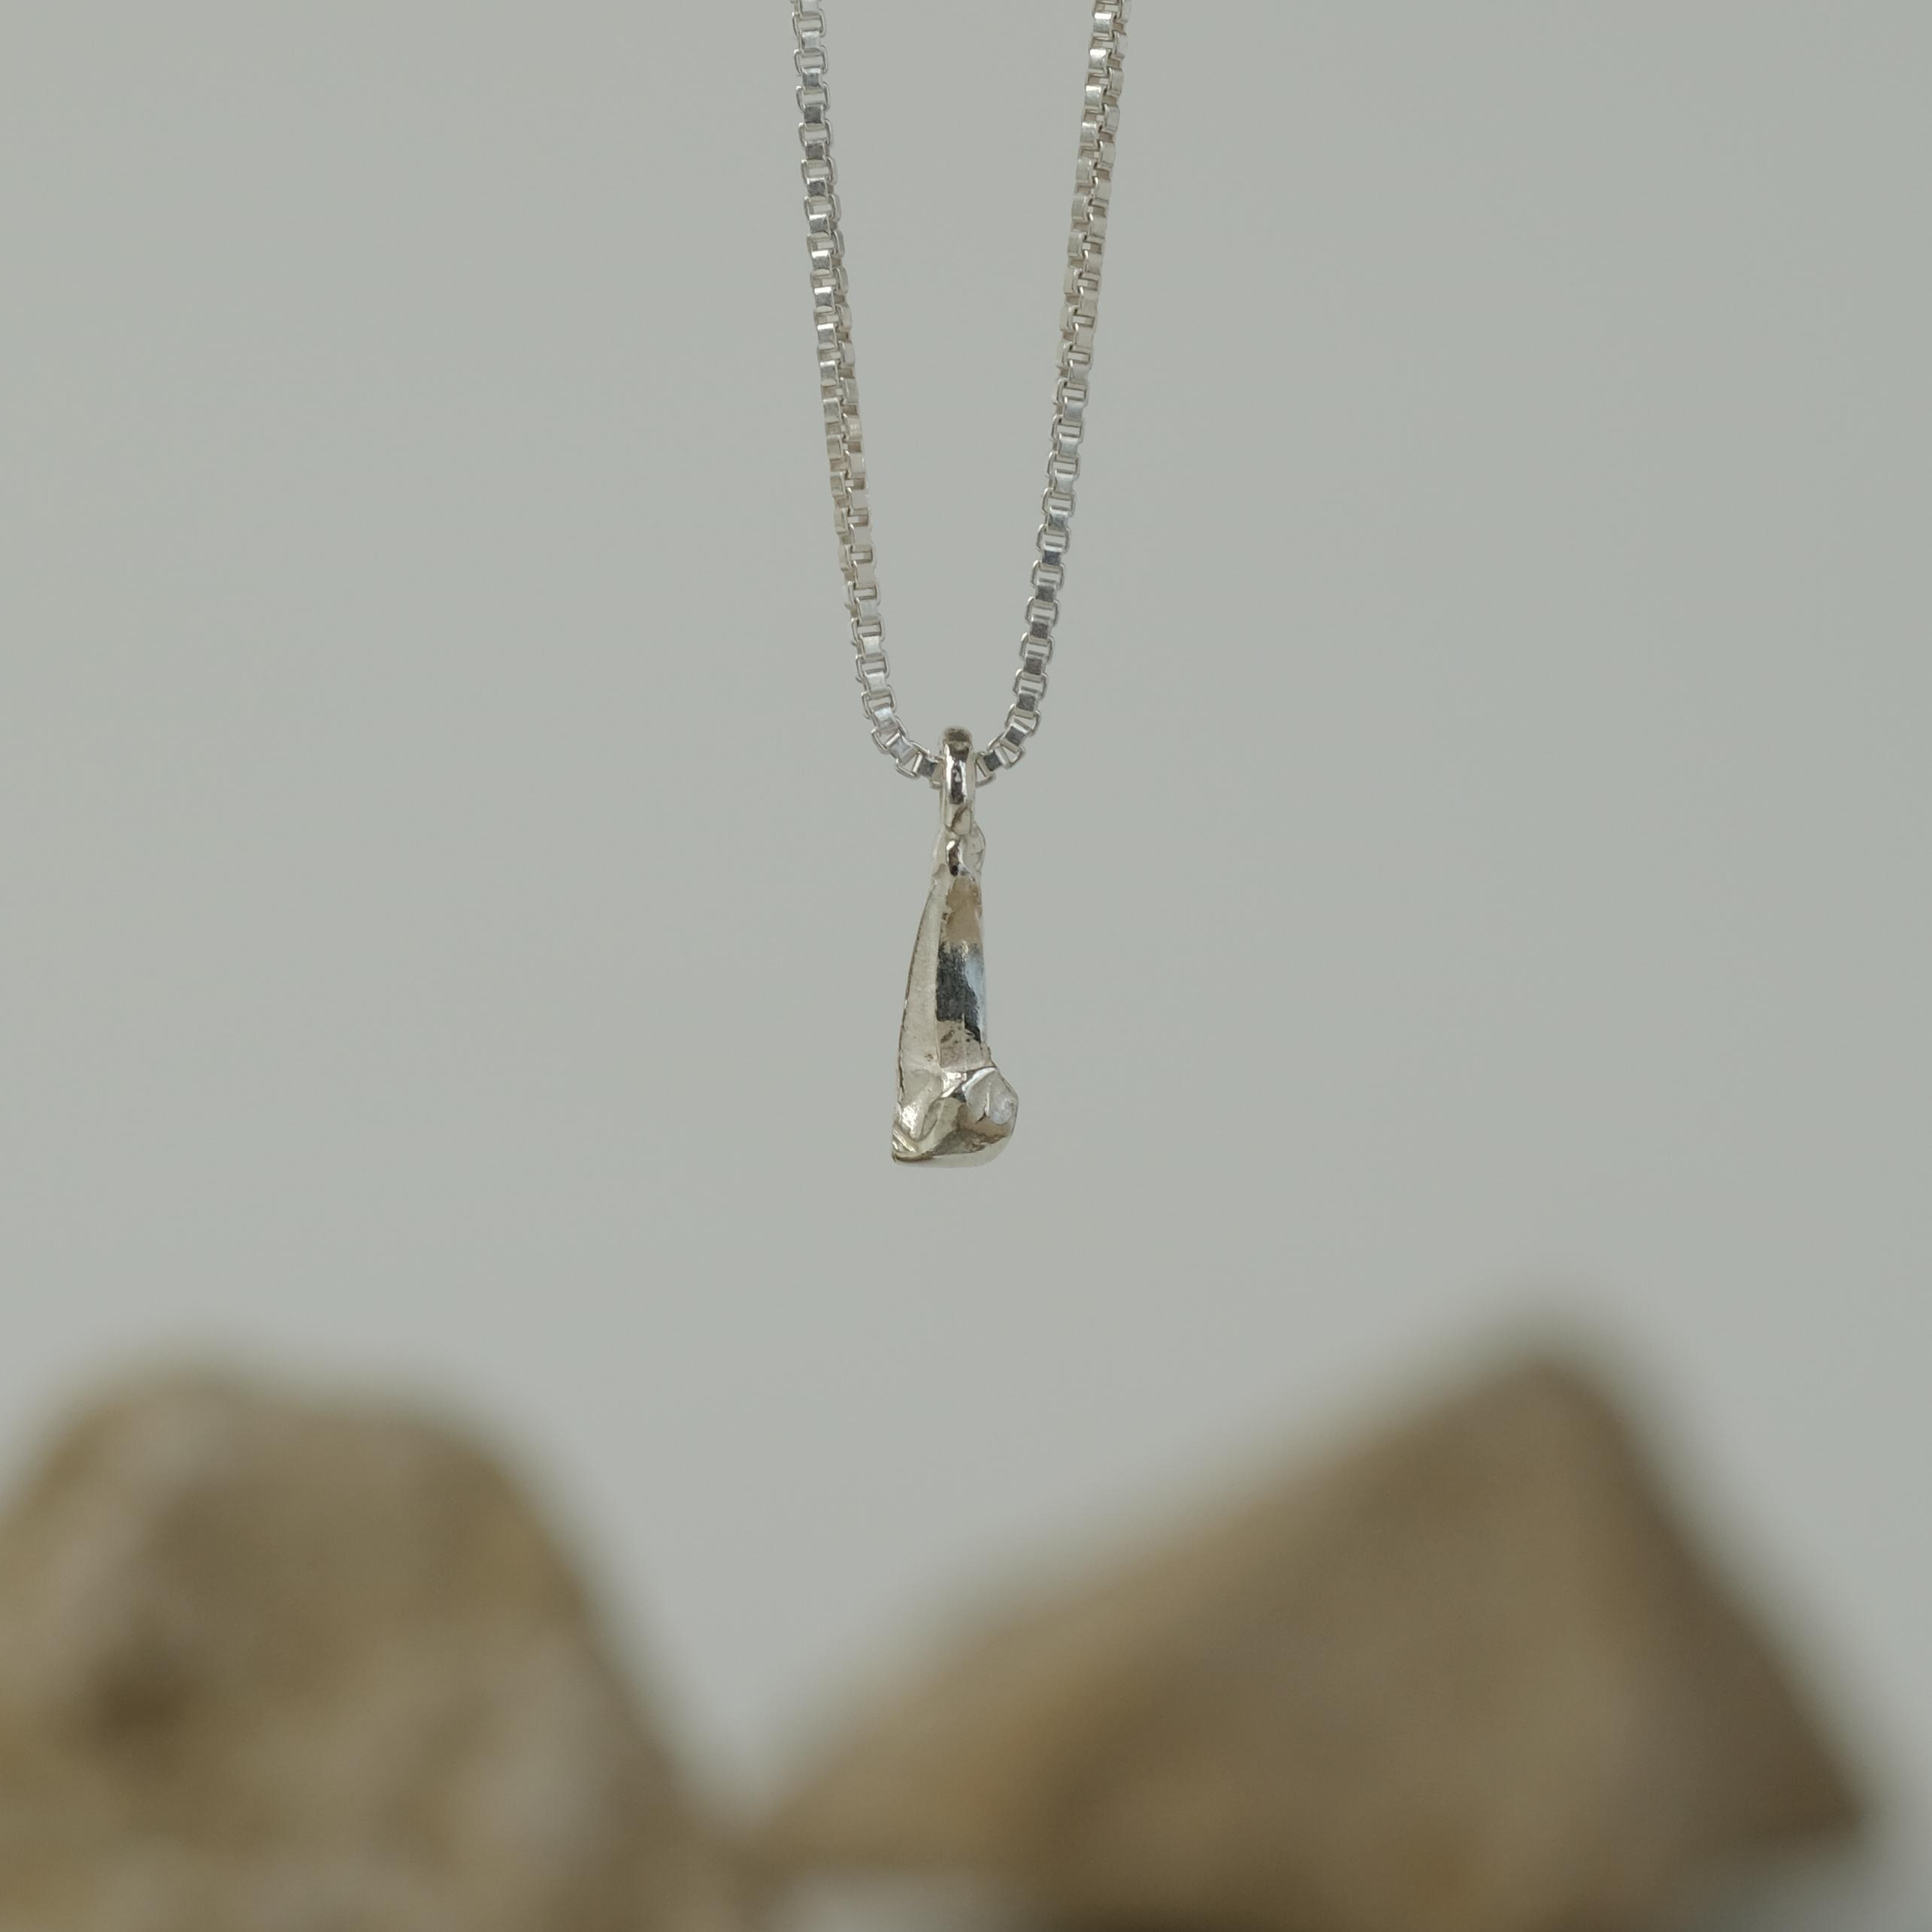 Sulfur Silver Necklace